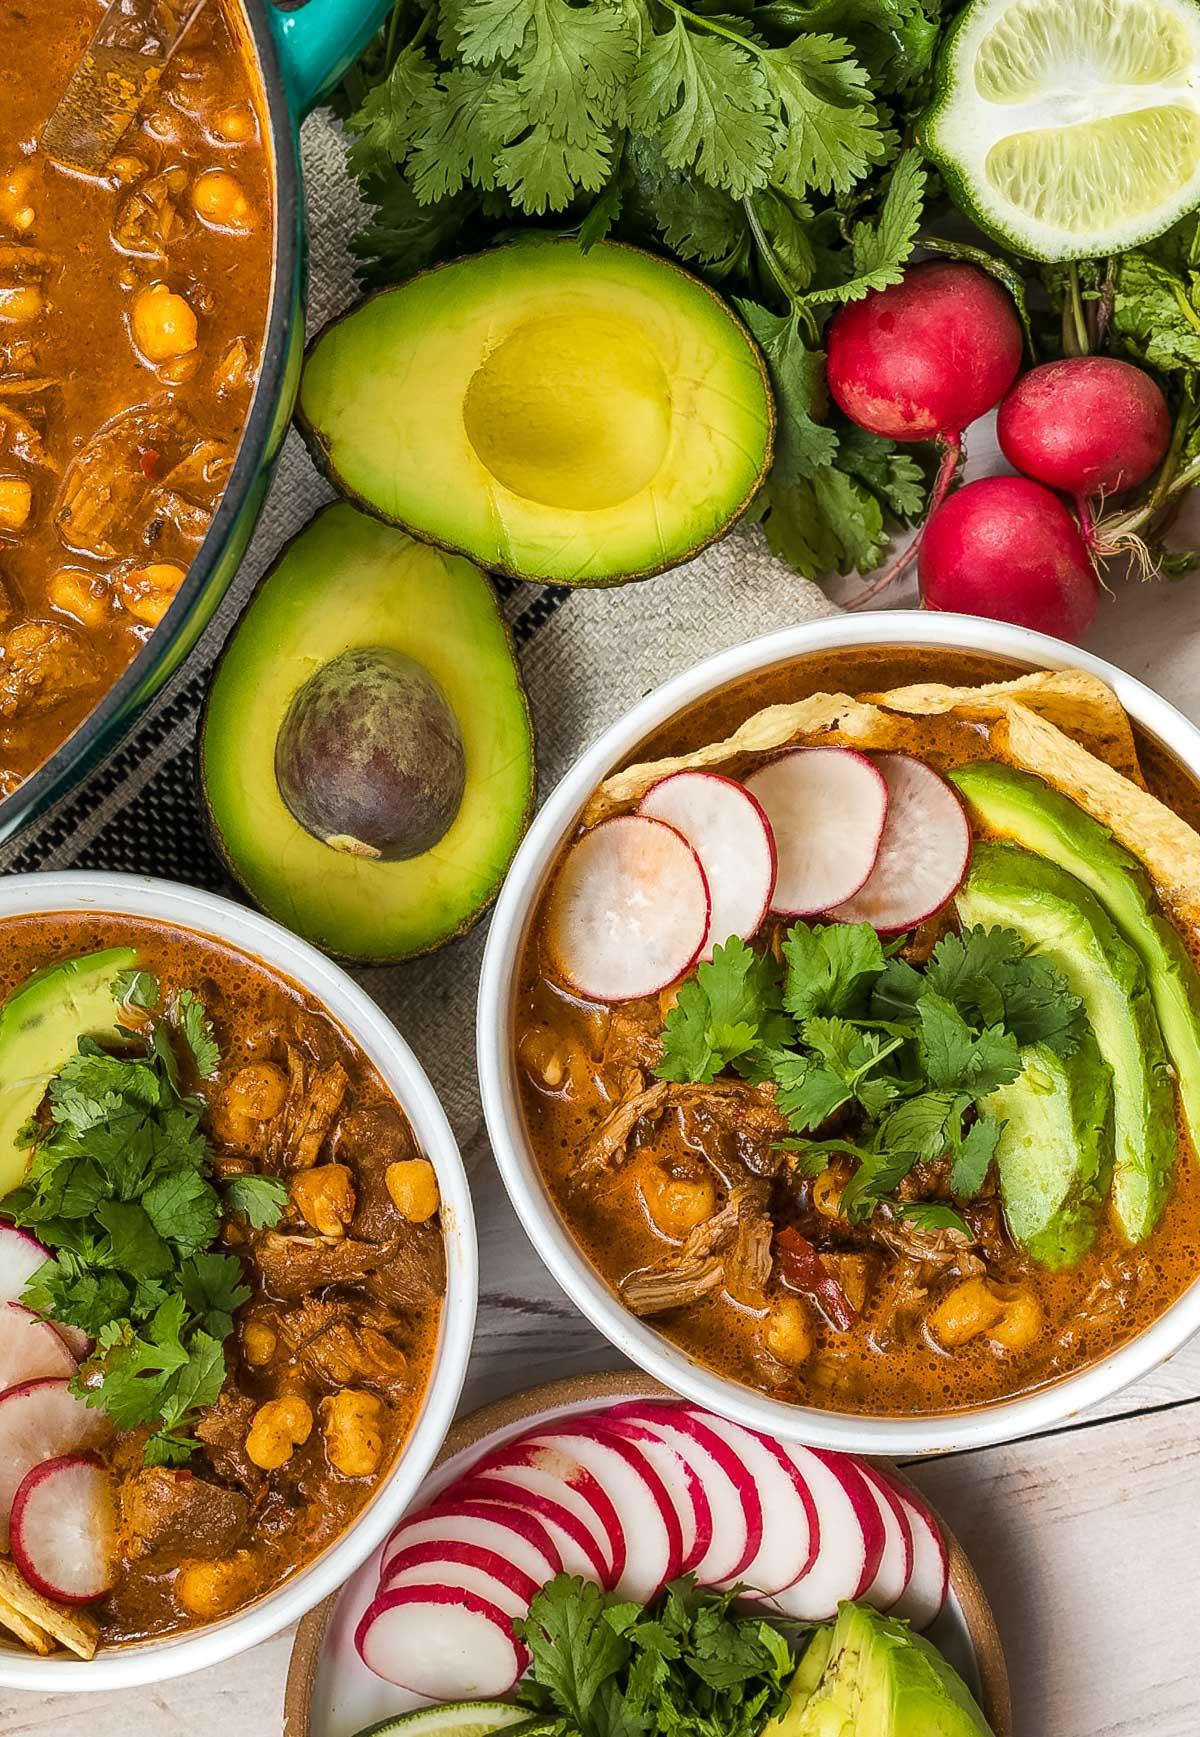 Red Posole Recipe with Pork (Pozole Rojo) #ASpicyPerspective #mexican #pork #pozole #posole #stew #soup